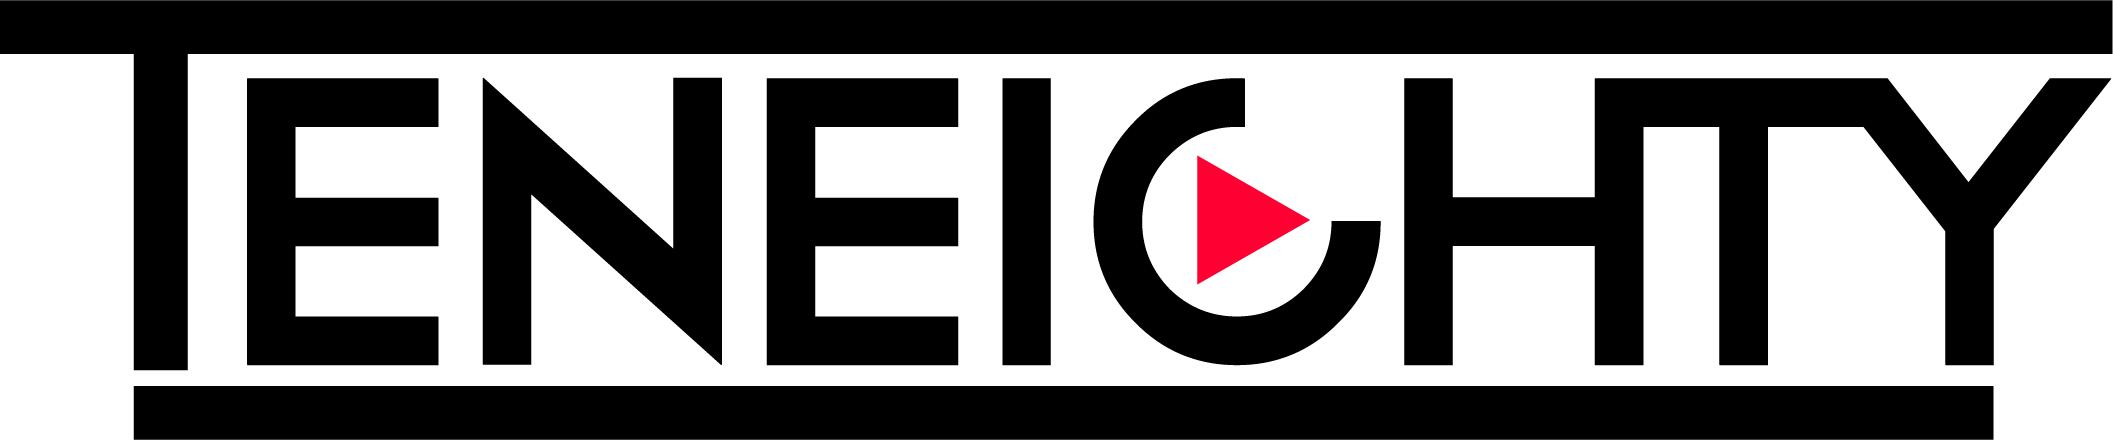 Музыку с YouTube и Google Play Музыка для слияния - TenEighty 1